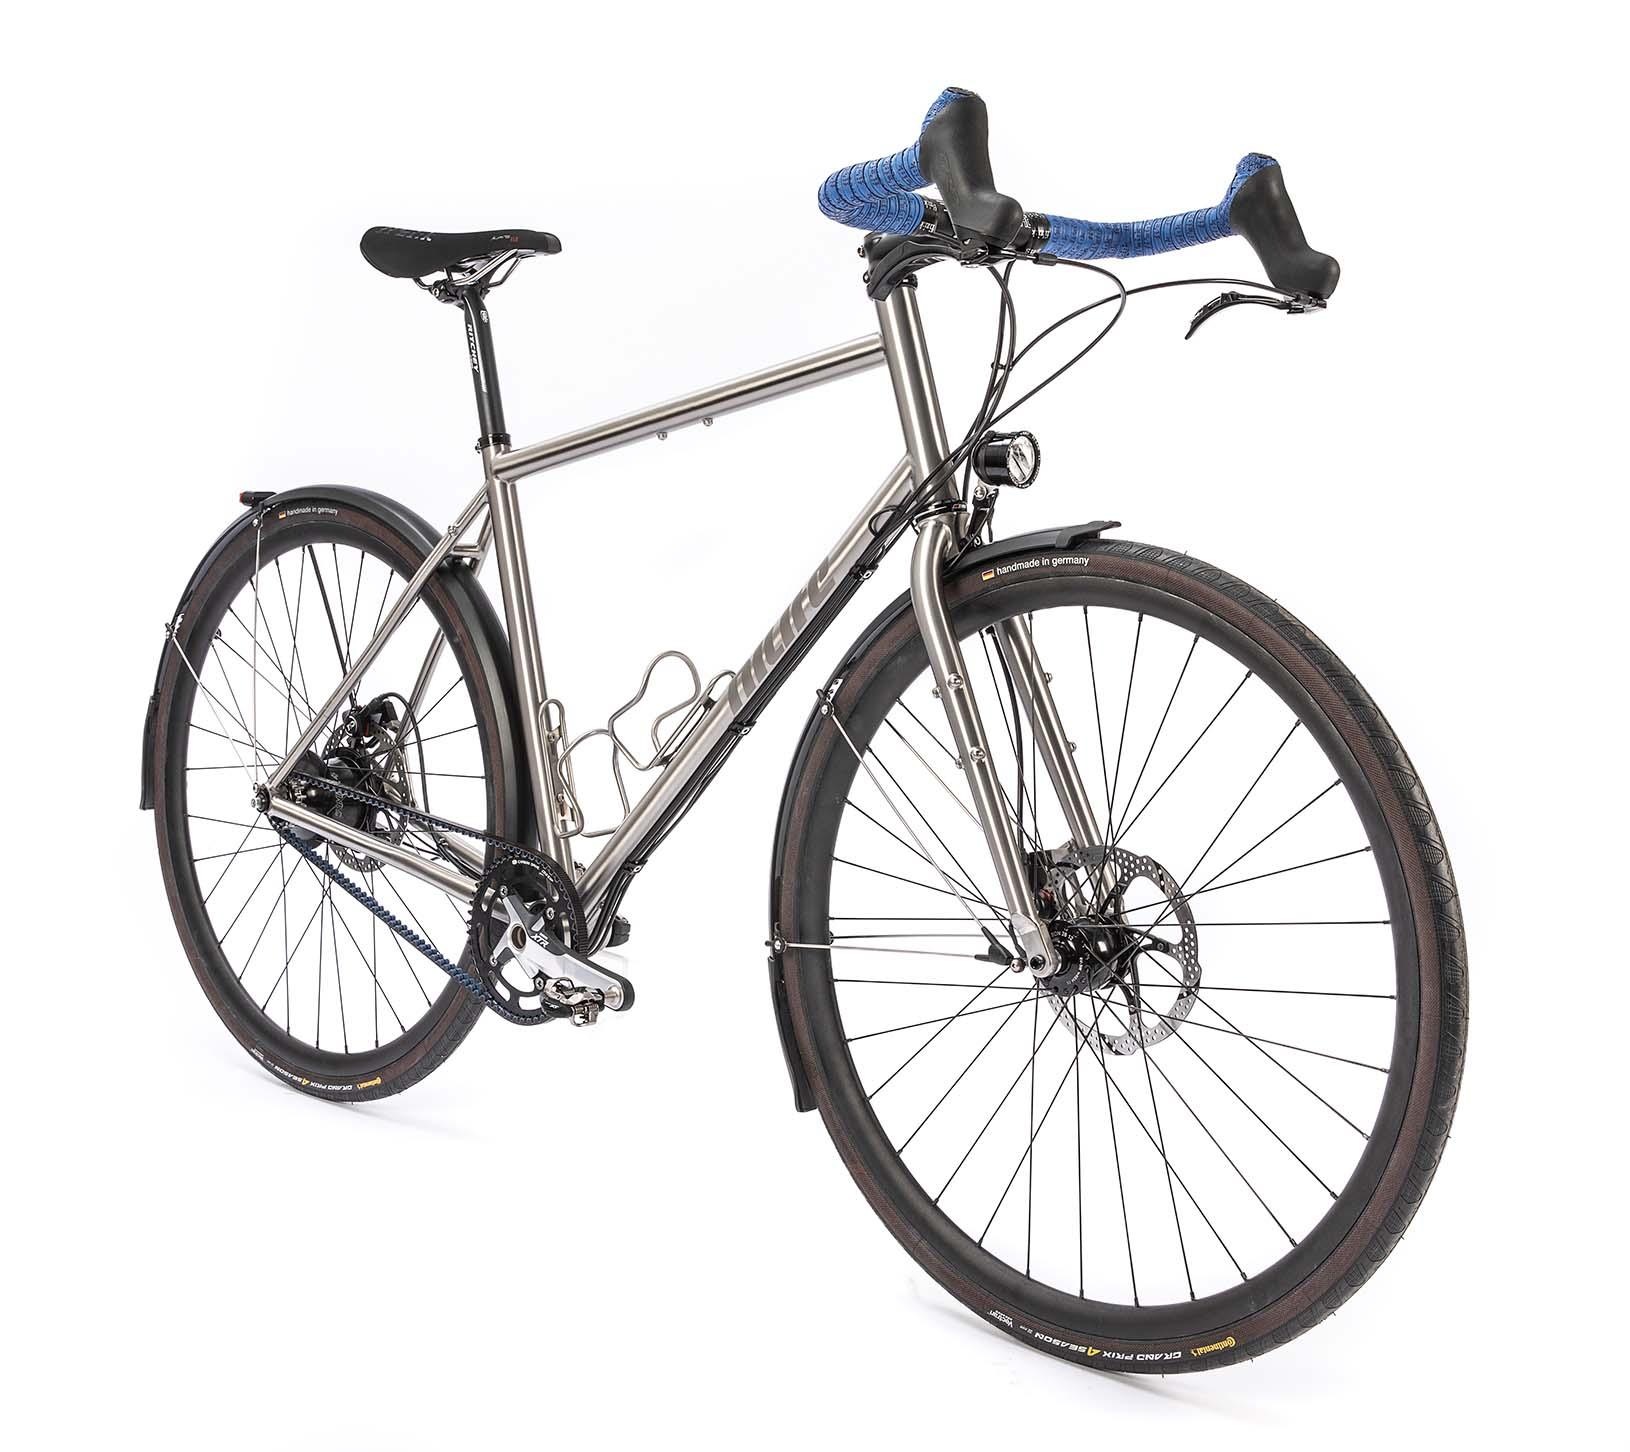 Rohloff Randonneur & Gravel Titan Fahrrad_2